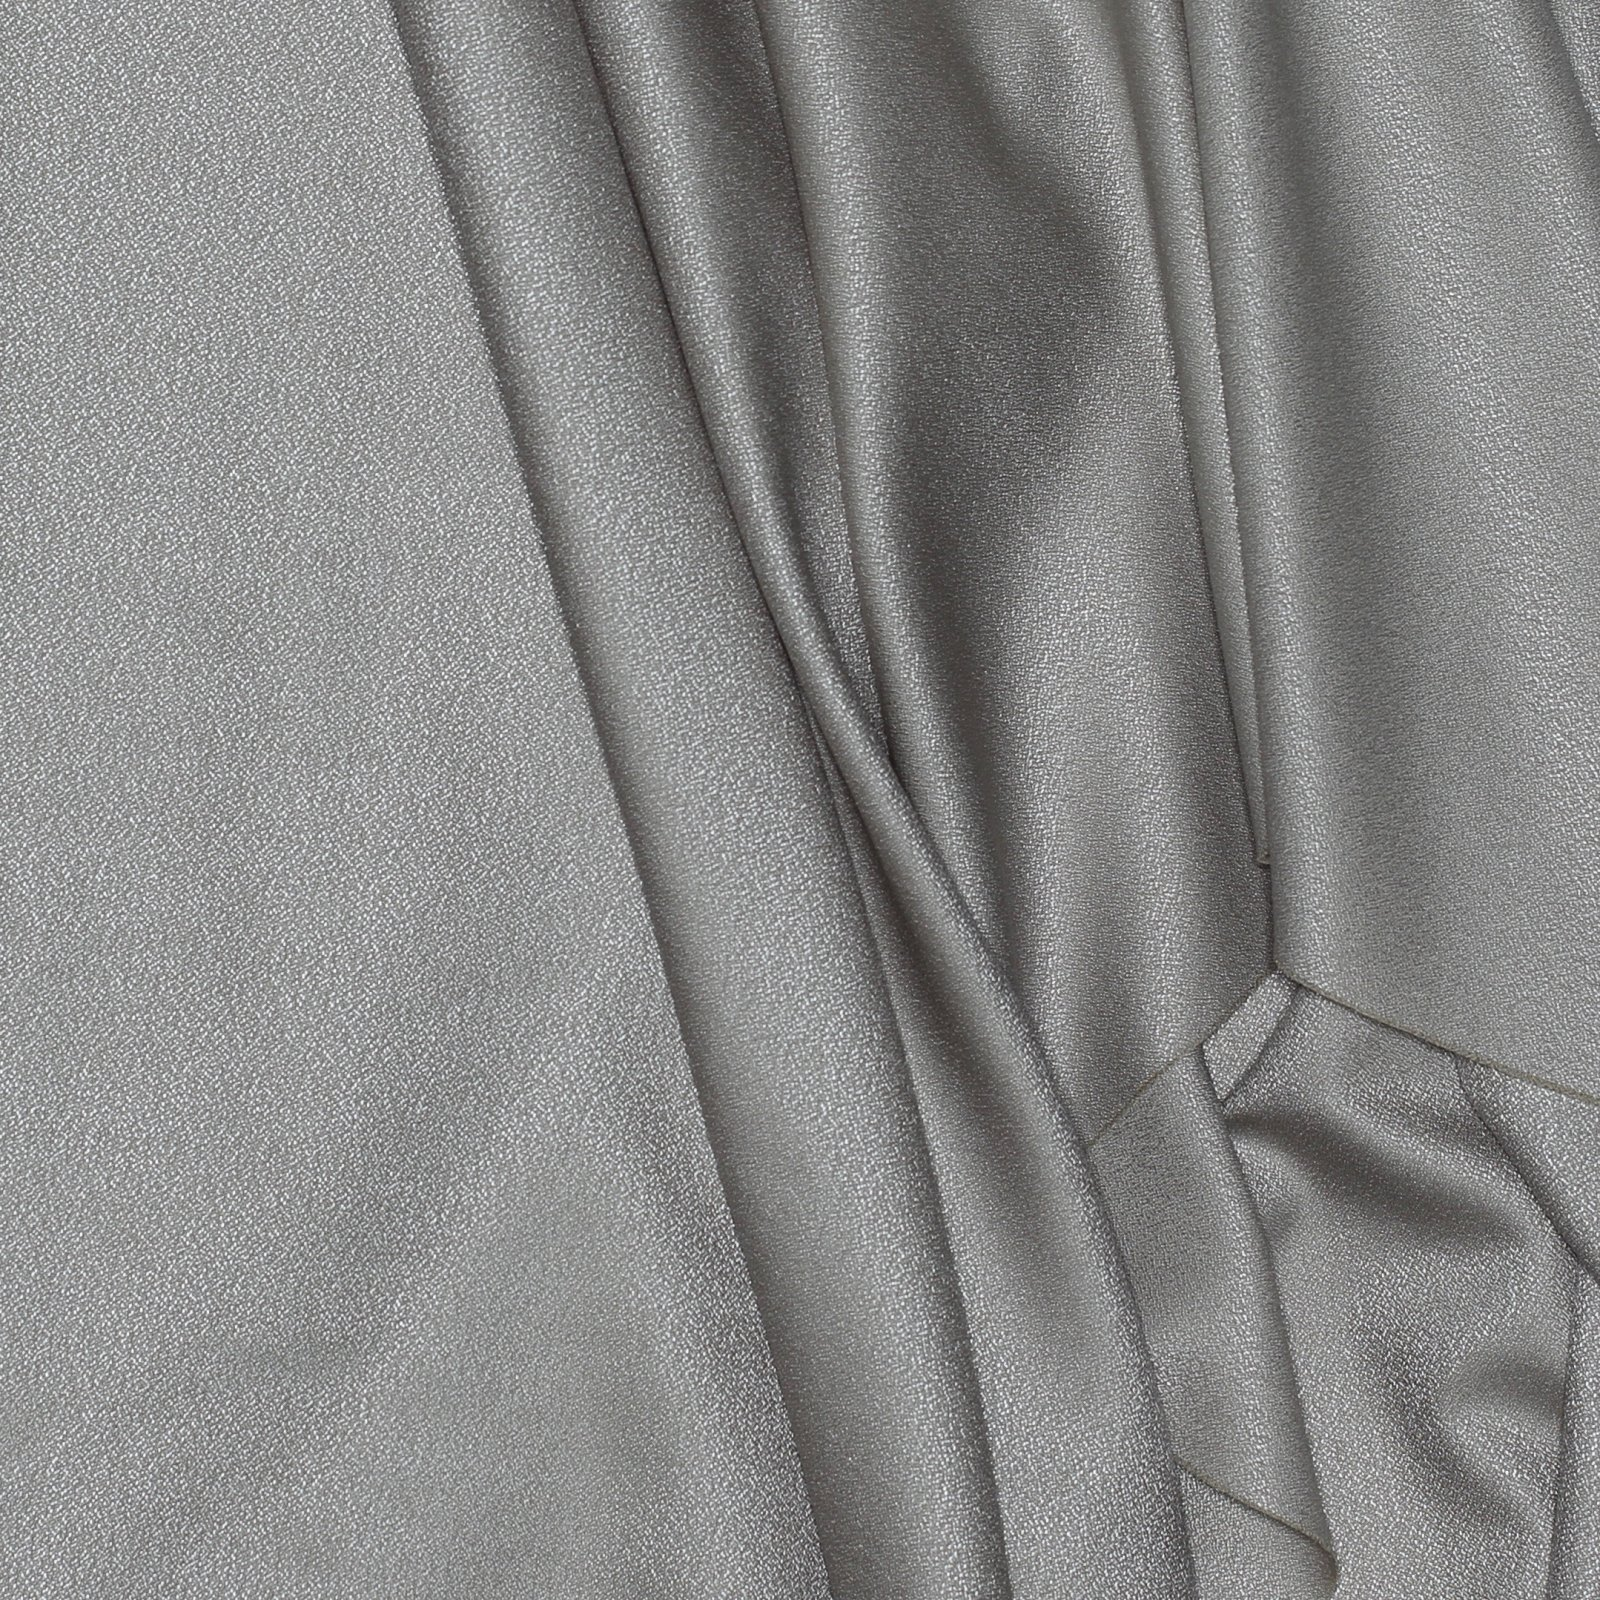 Gold Speckled Italian Wool/Silk Blend